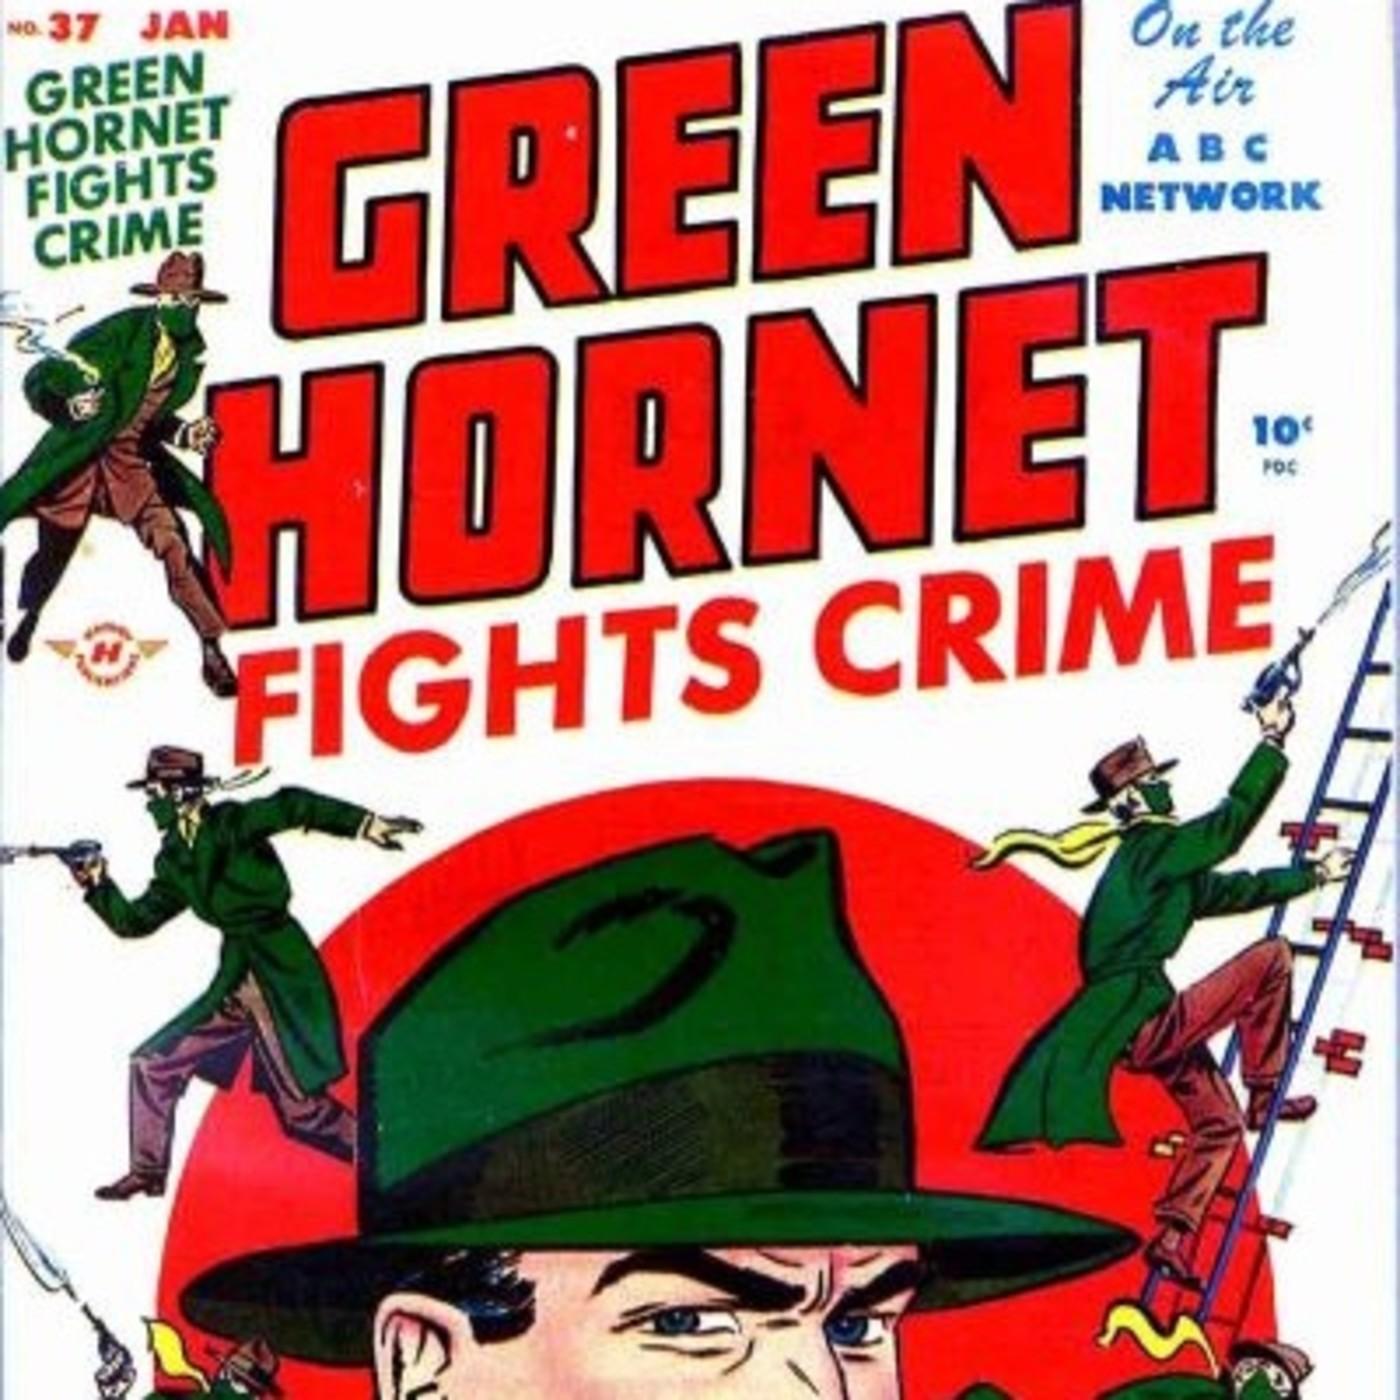 The Green Hornet - 00 - 451101 Ballots And Bluff.mp3